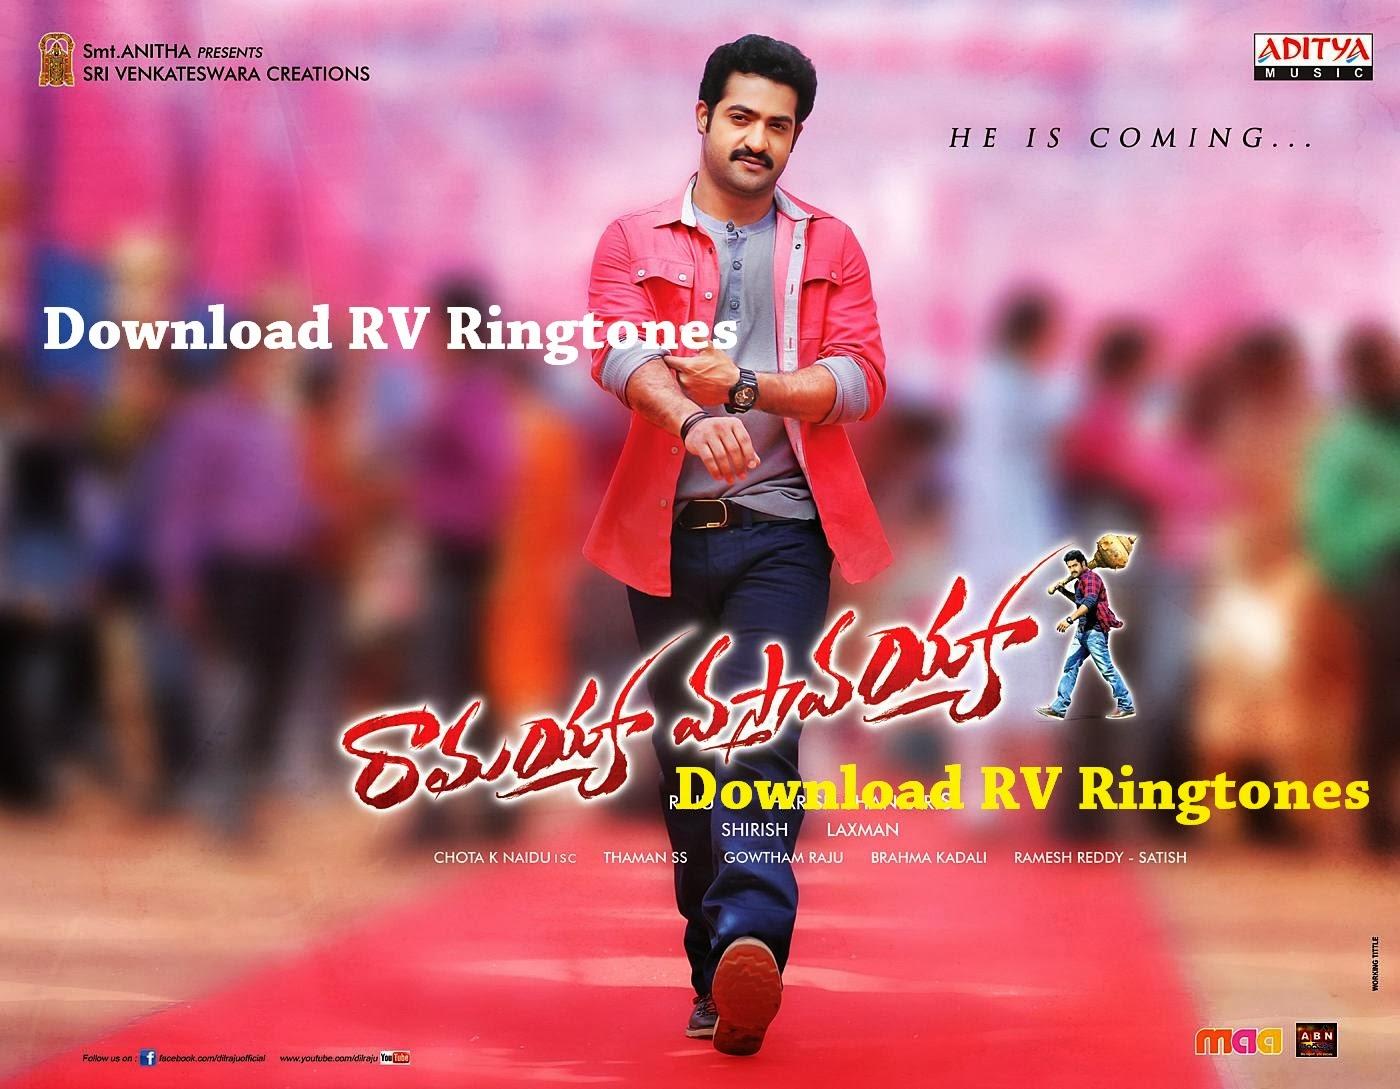 bahubali 2 songs ringtone download mp3